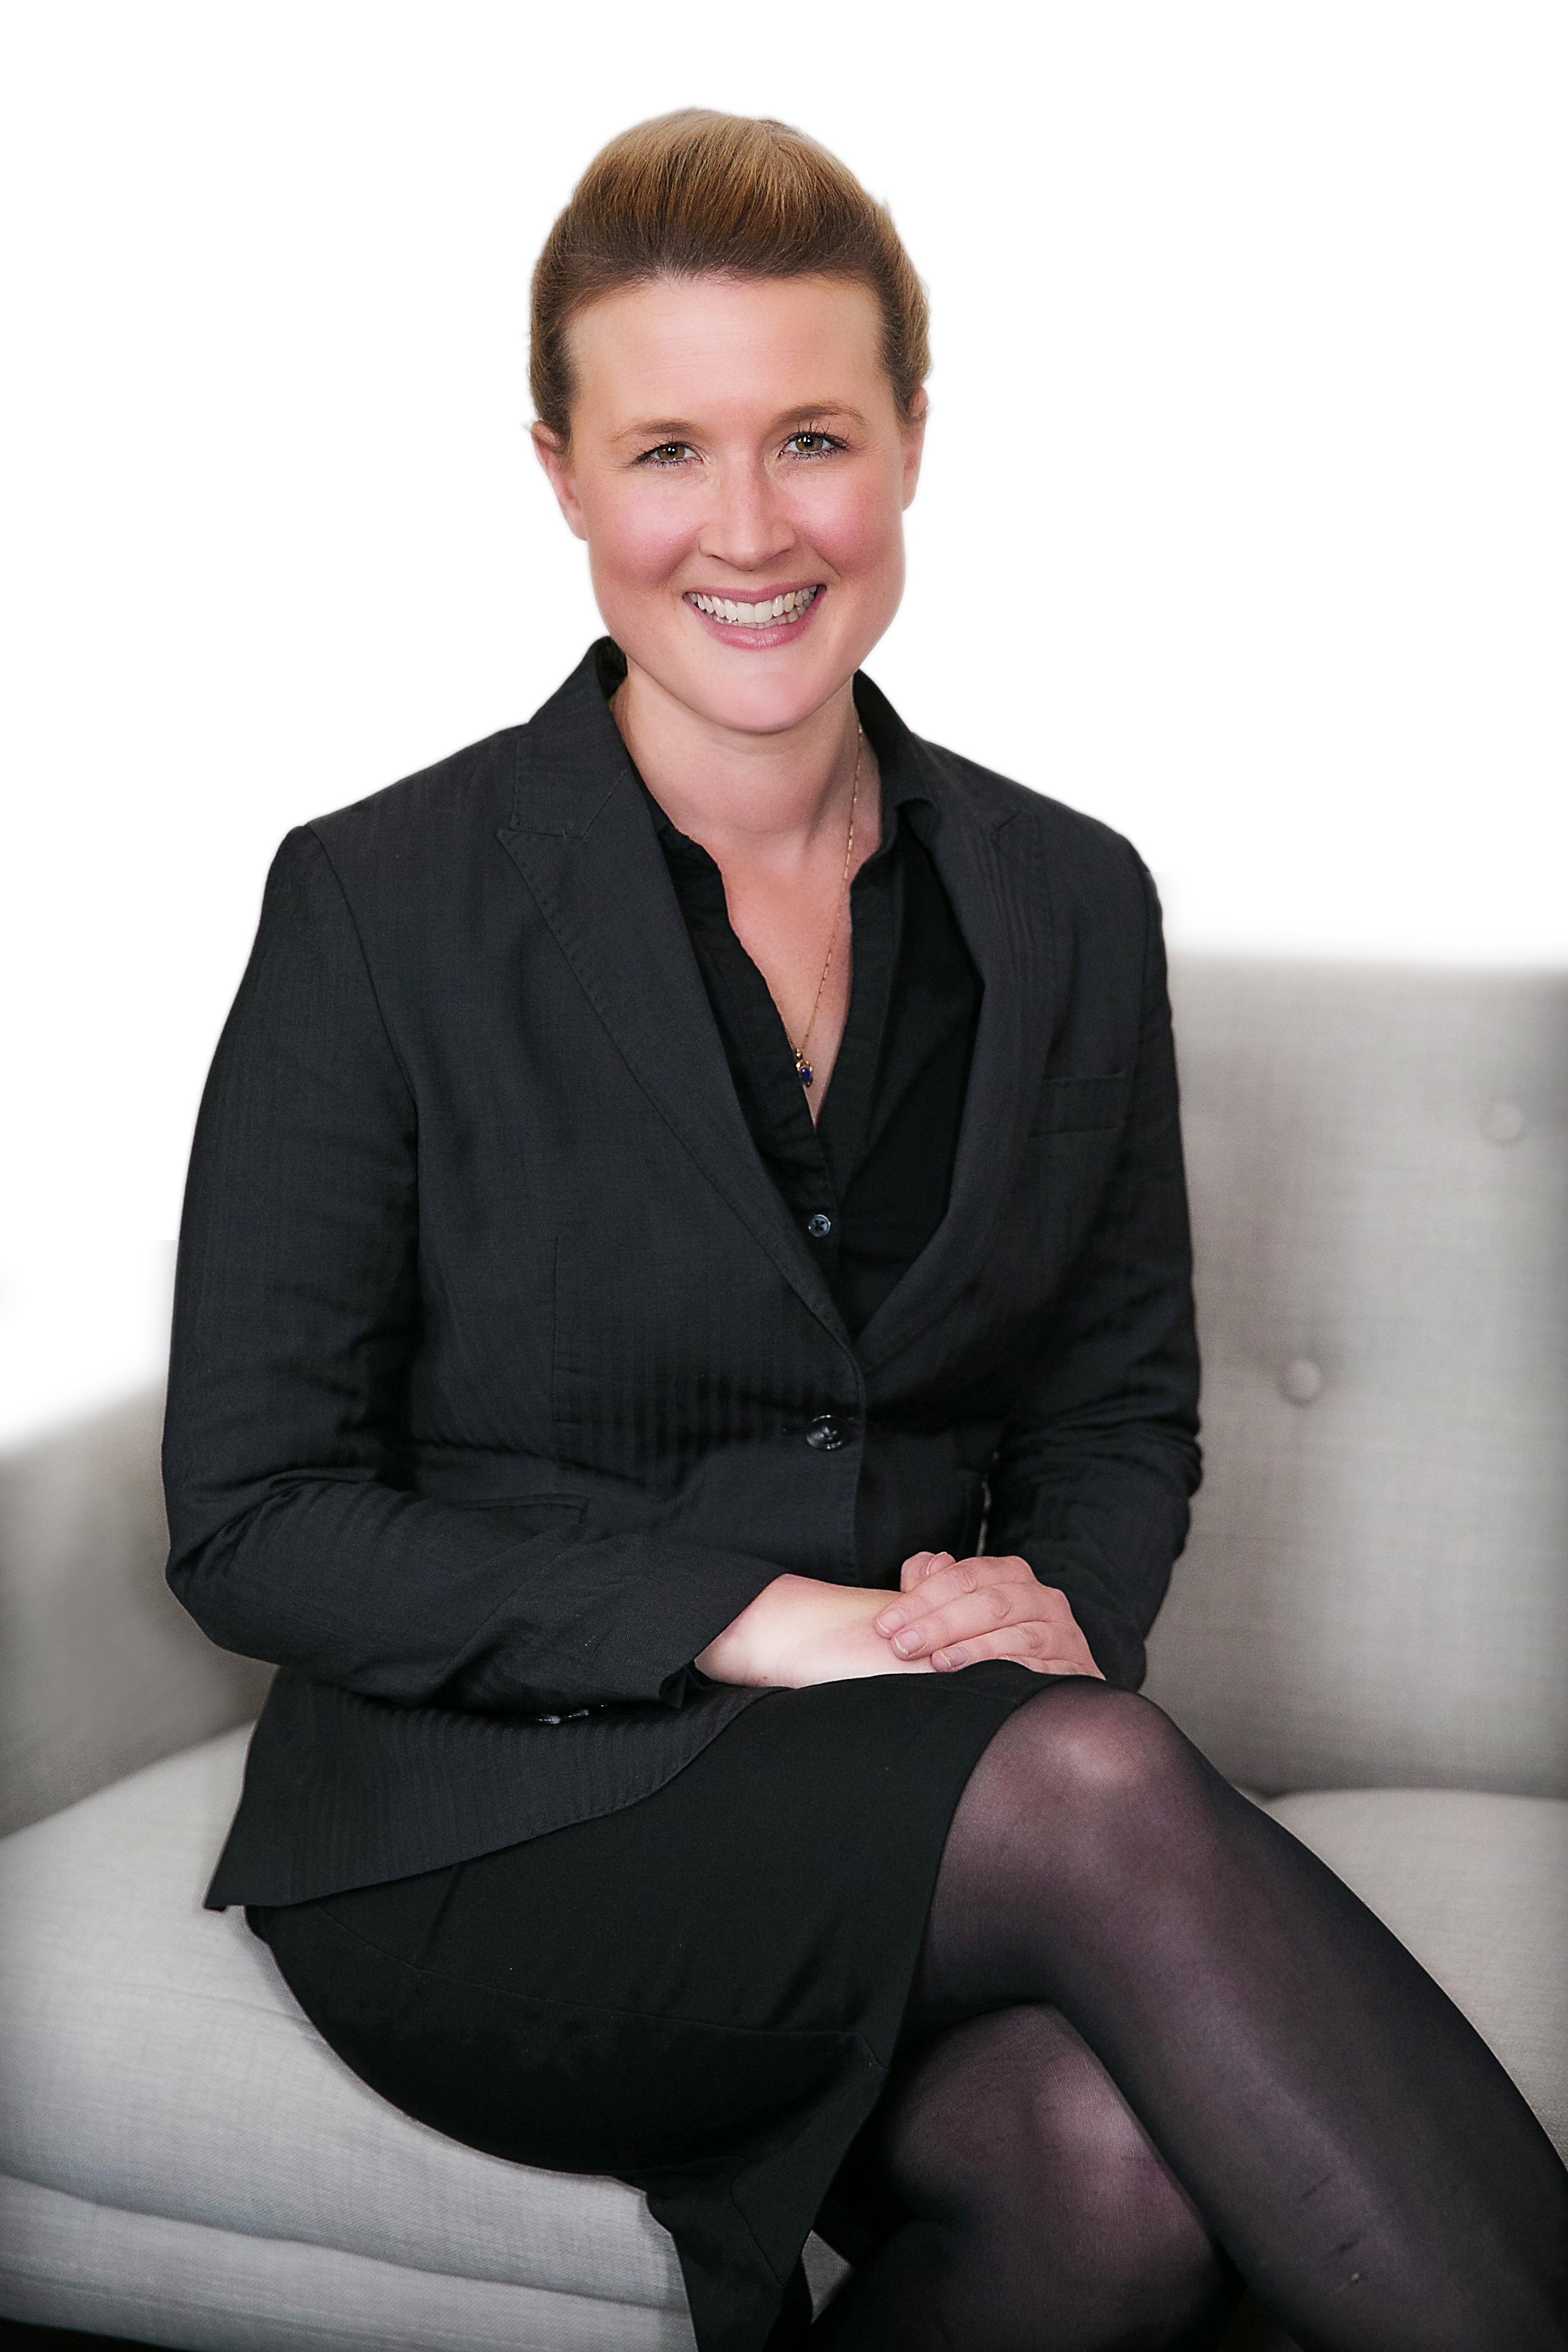 Erin Cubley